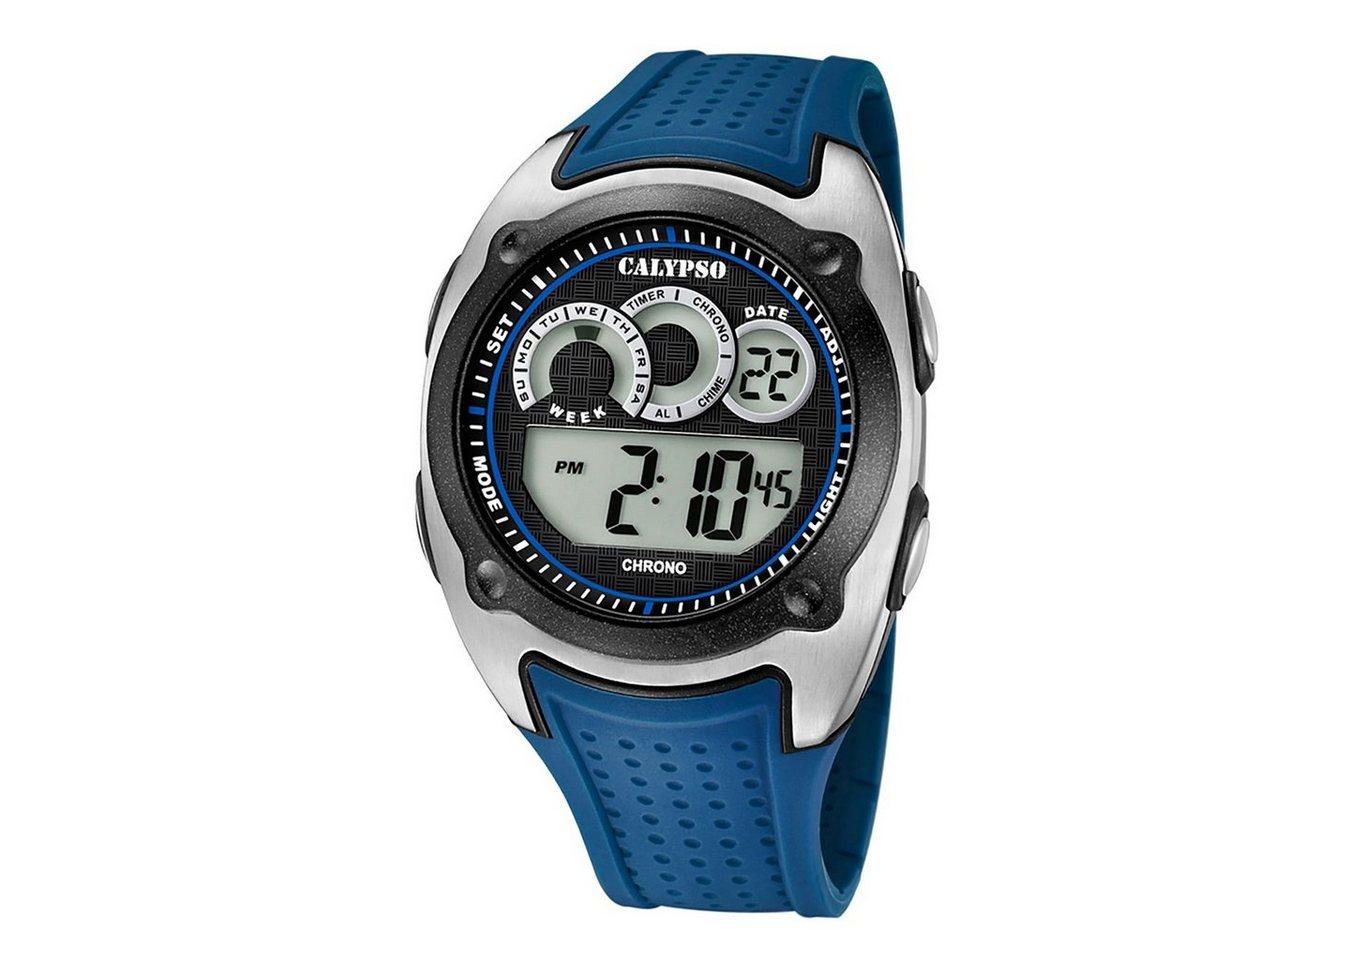 calypso watches -  Digitaluhr »UK5722/3 Calypso Herren Uhr K5722/3 Kunststoff PUR«, (Digitaluhr), Herren Armbanduhr rund, Kunststoff, PURarmband blau, Sport